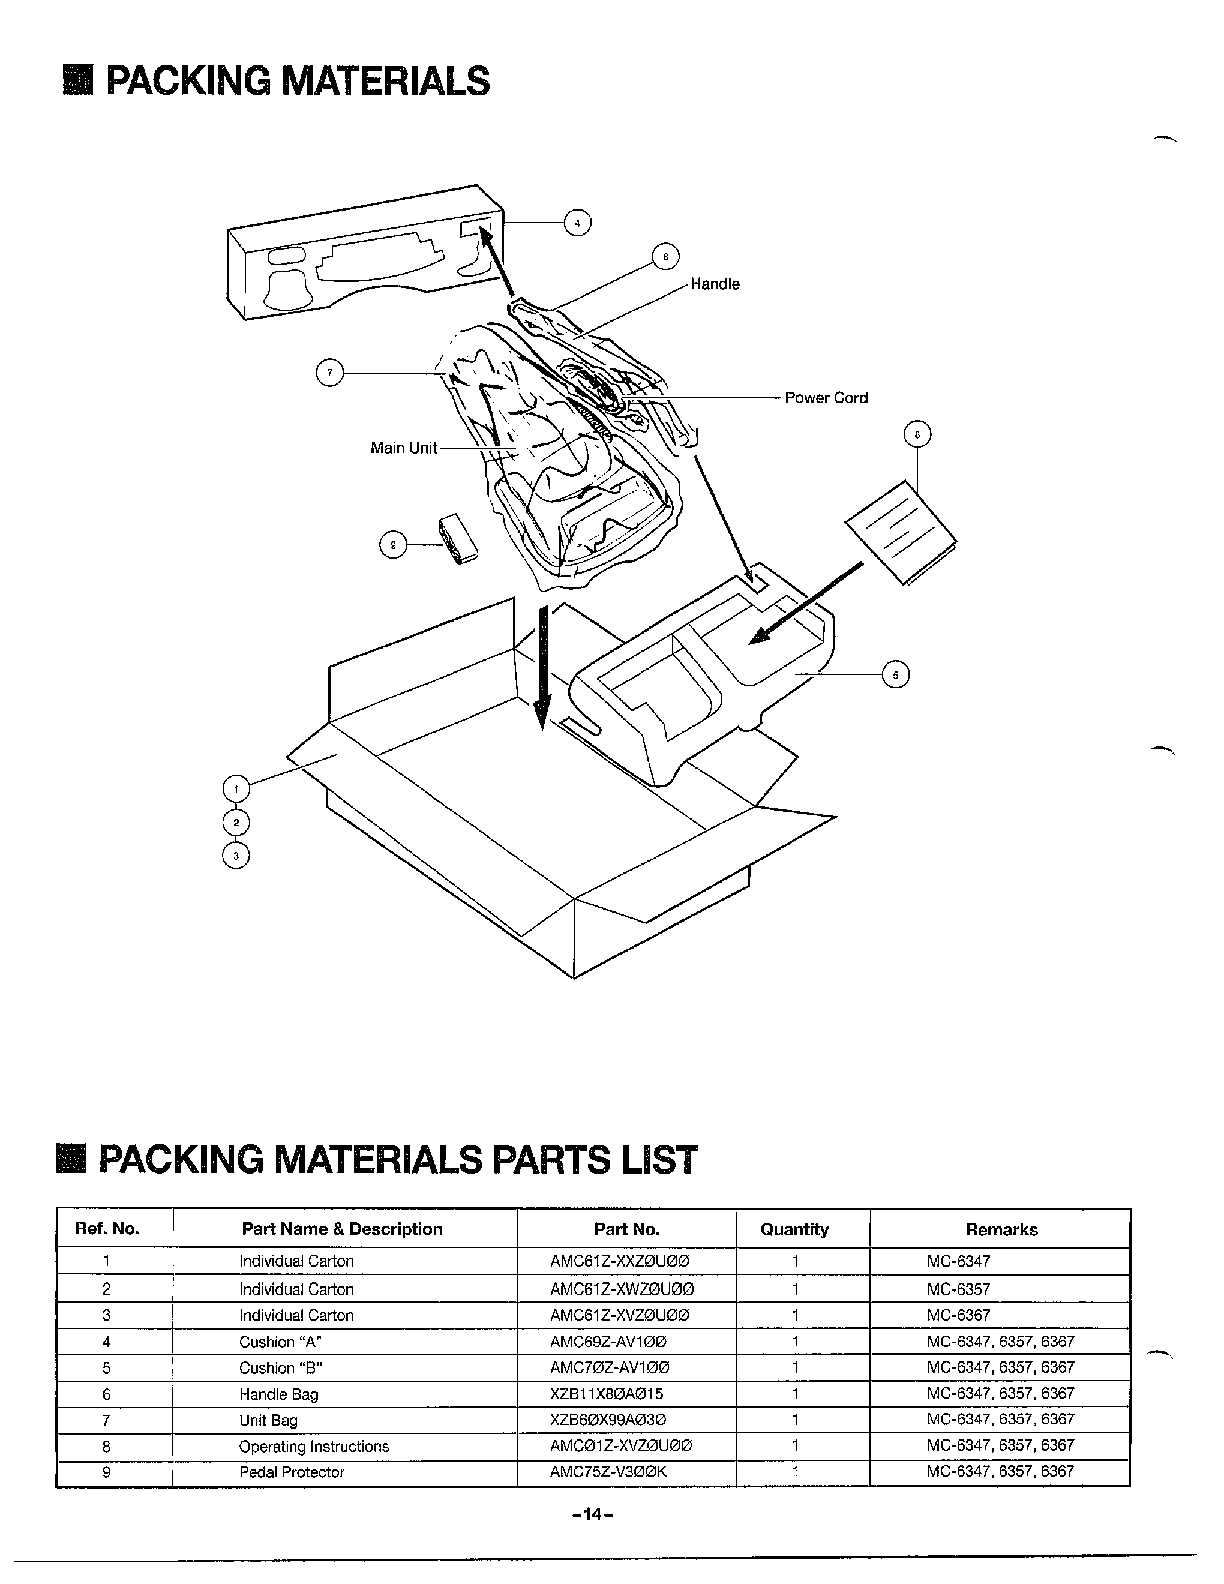 Panasonic model MC-6347 vacuum, upright genuine parts